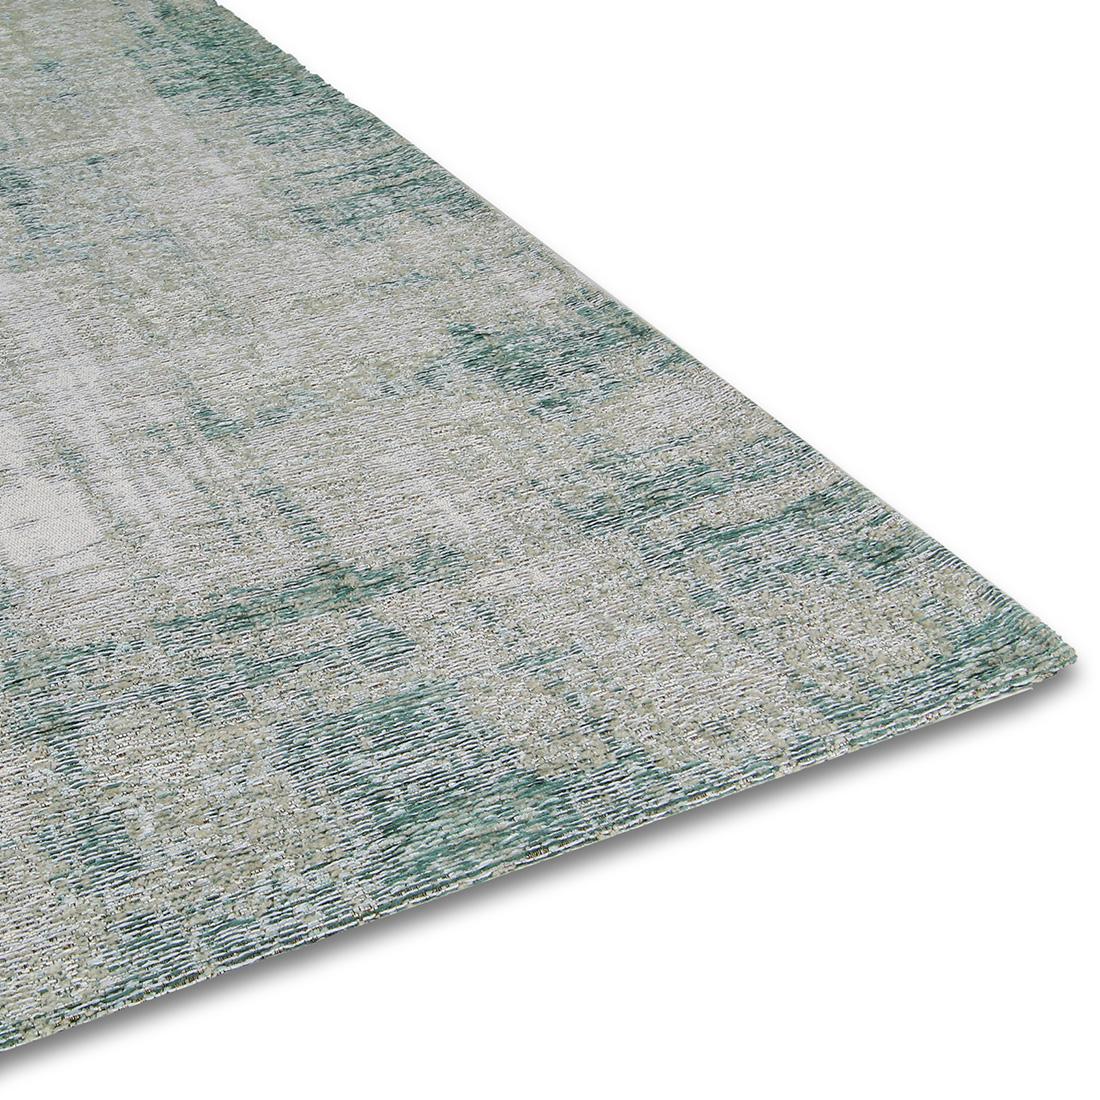 Vloerkleed Brinker Grunge Aqua | 240 x 340 cm